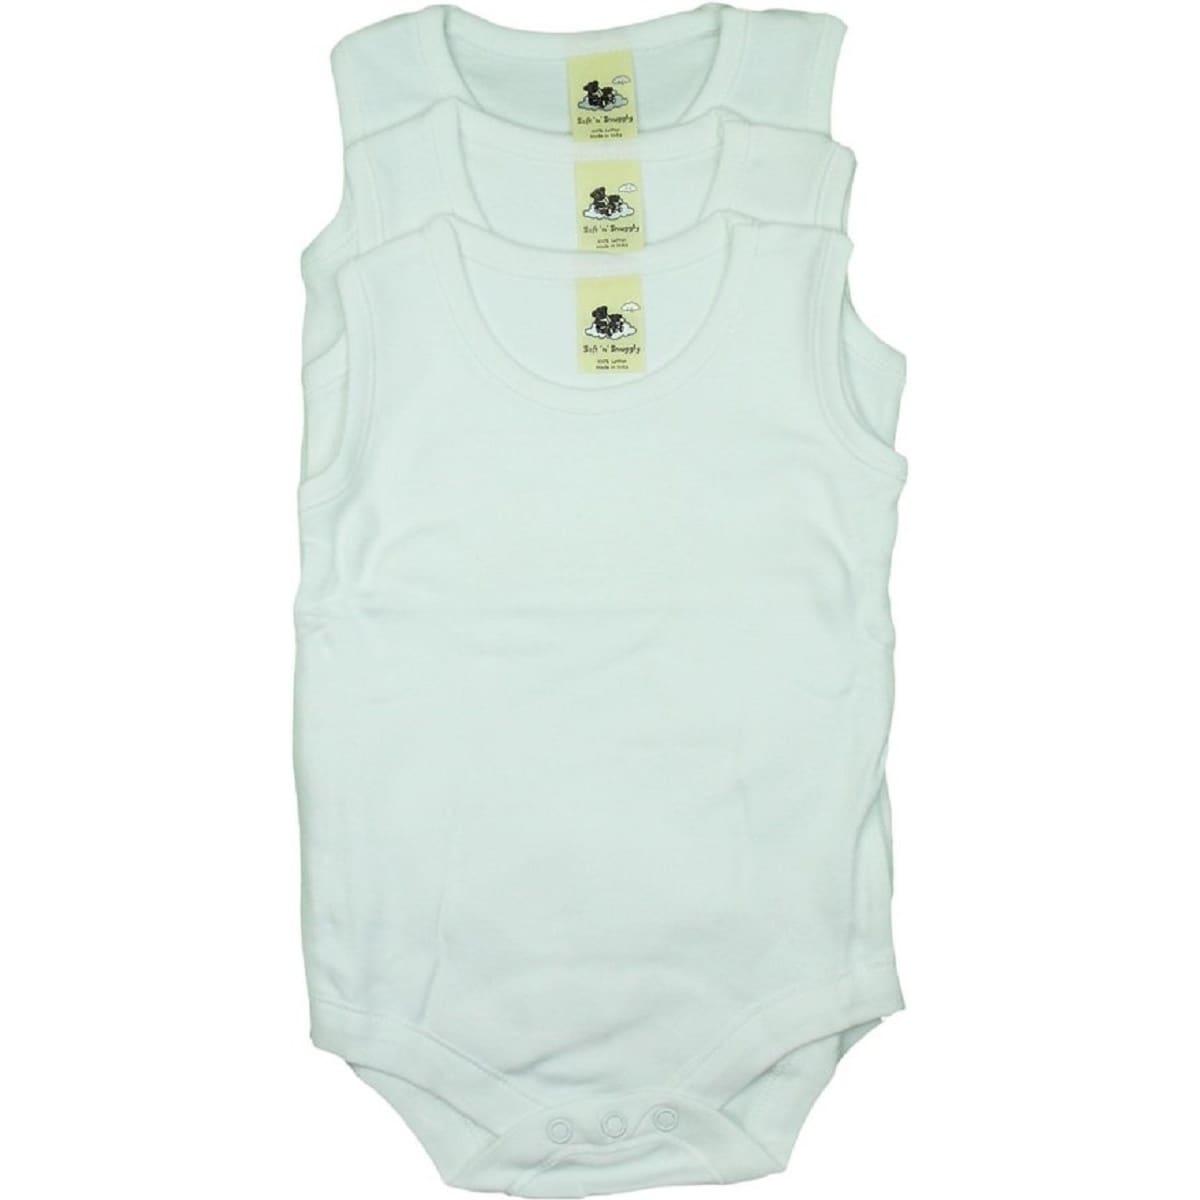 Soft N Snuggly Infant Toddler Bodysuits (Set of 3) (White...